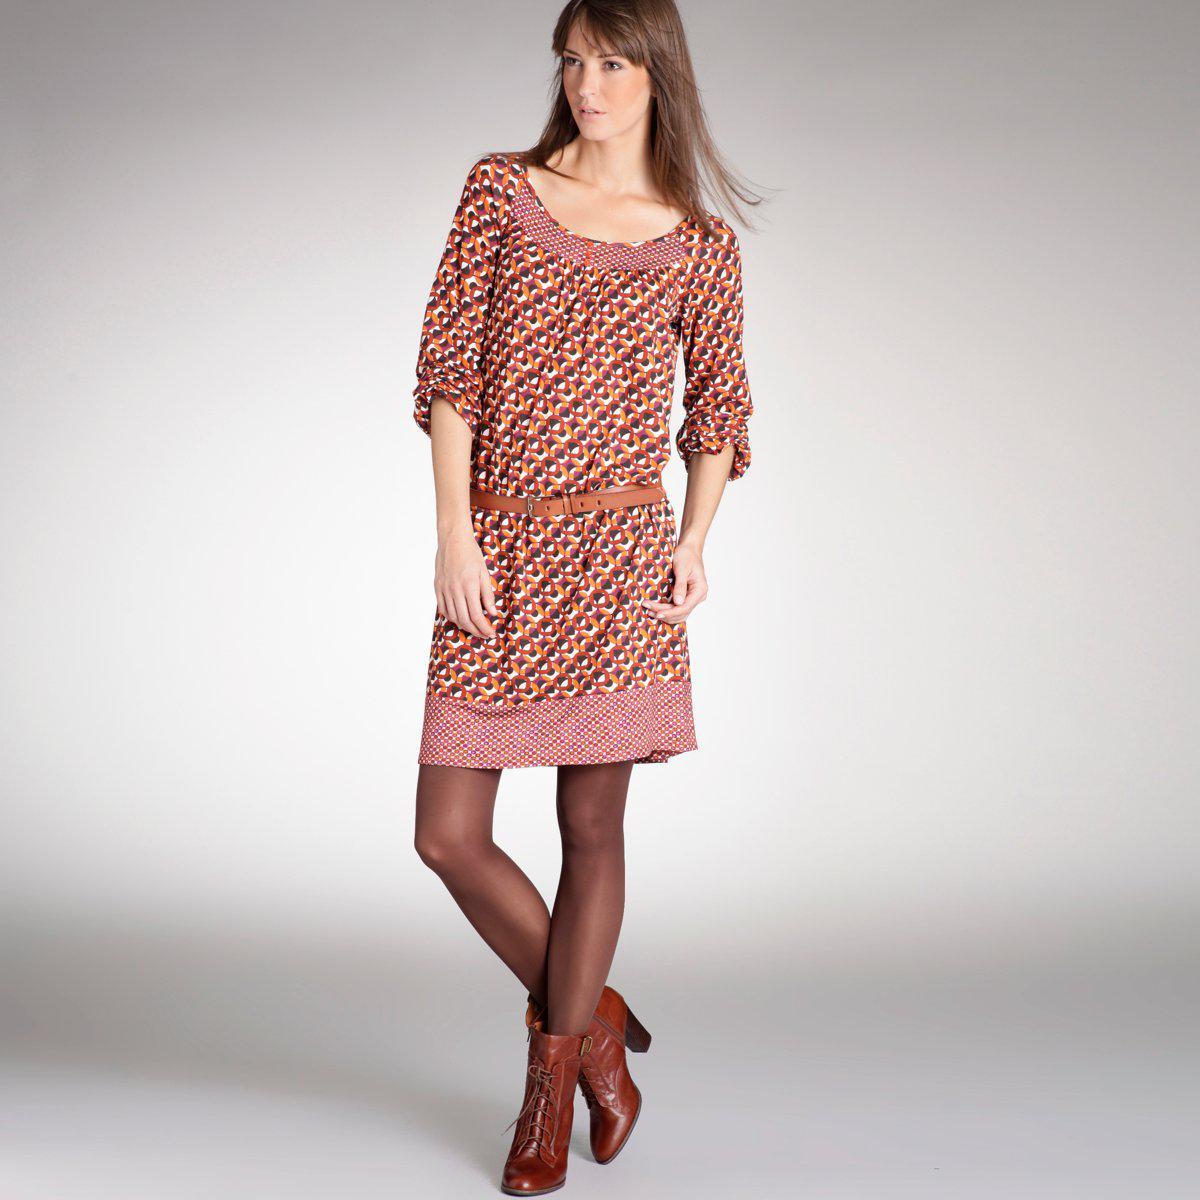 c3d94d0f1c49 Βραδυνα Φορεματα LaRedoute Φθινόπωρο 2011 Κωδ. 324265881